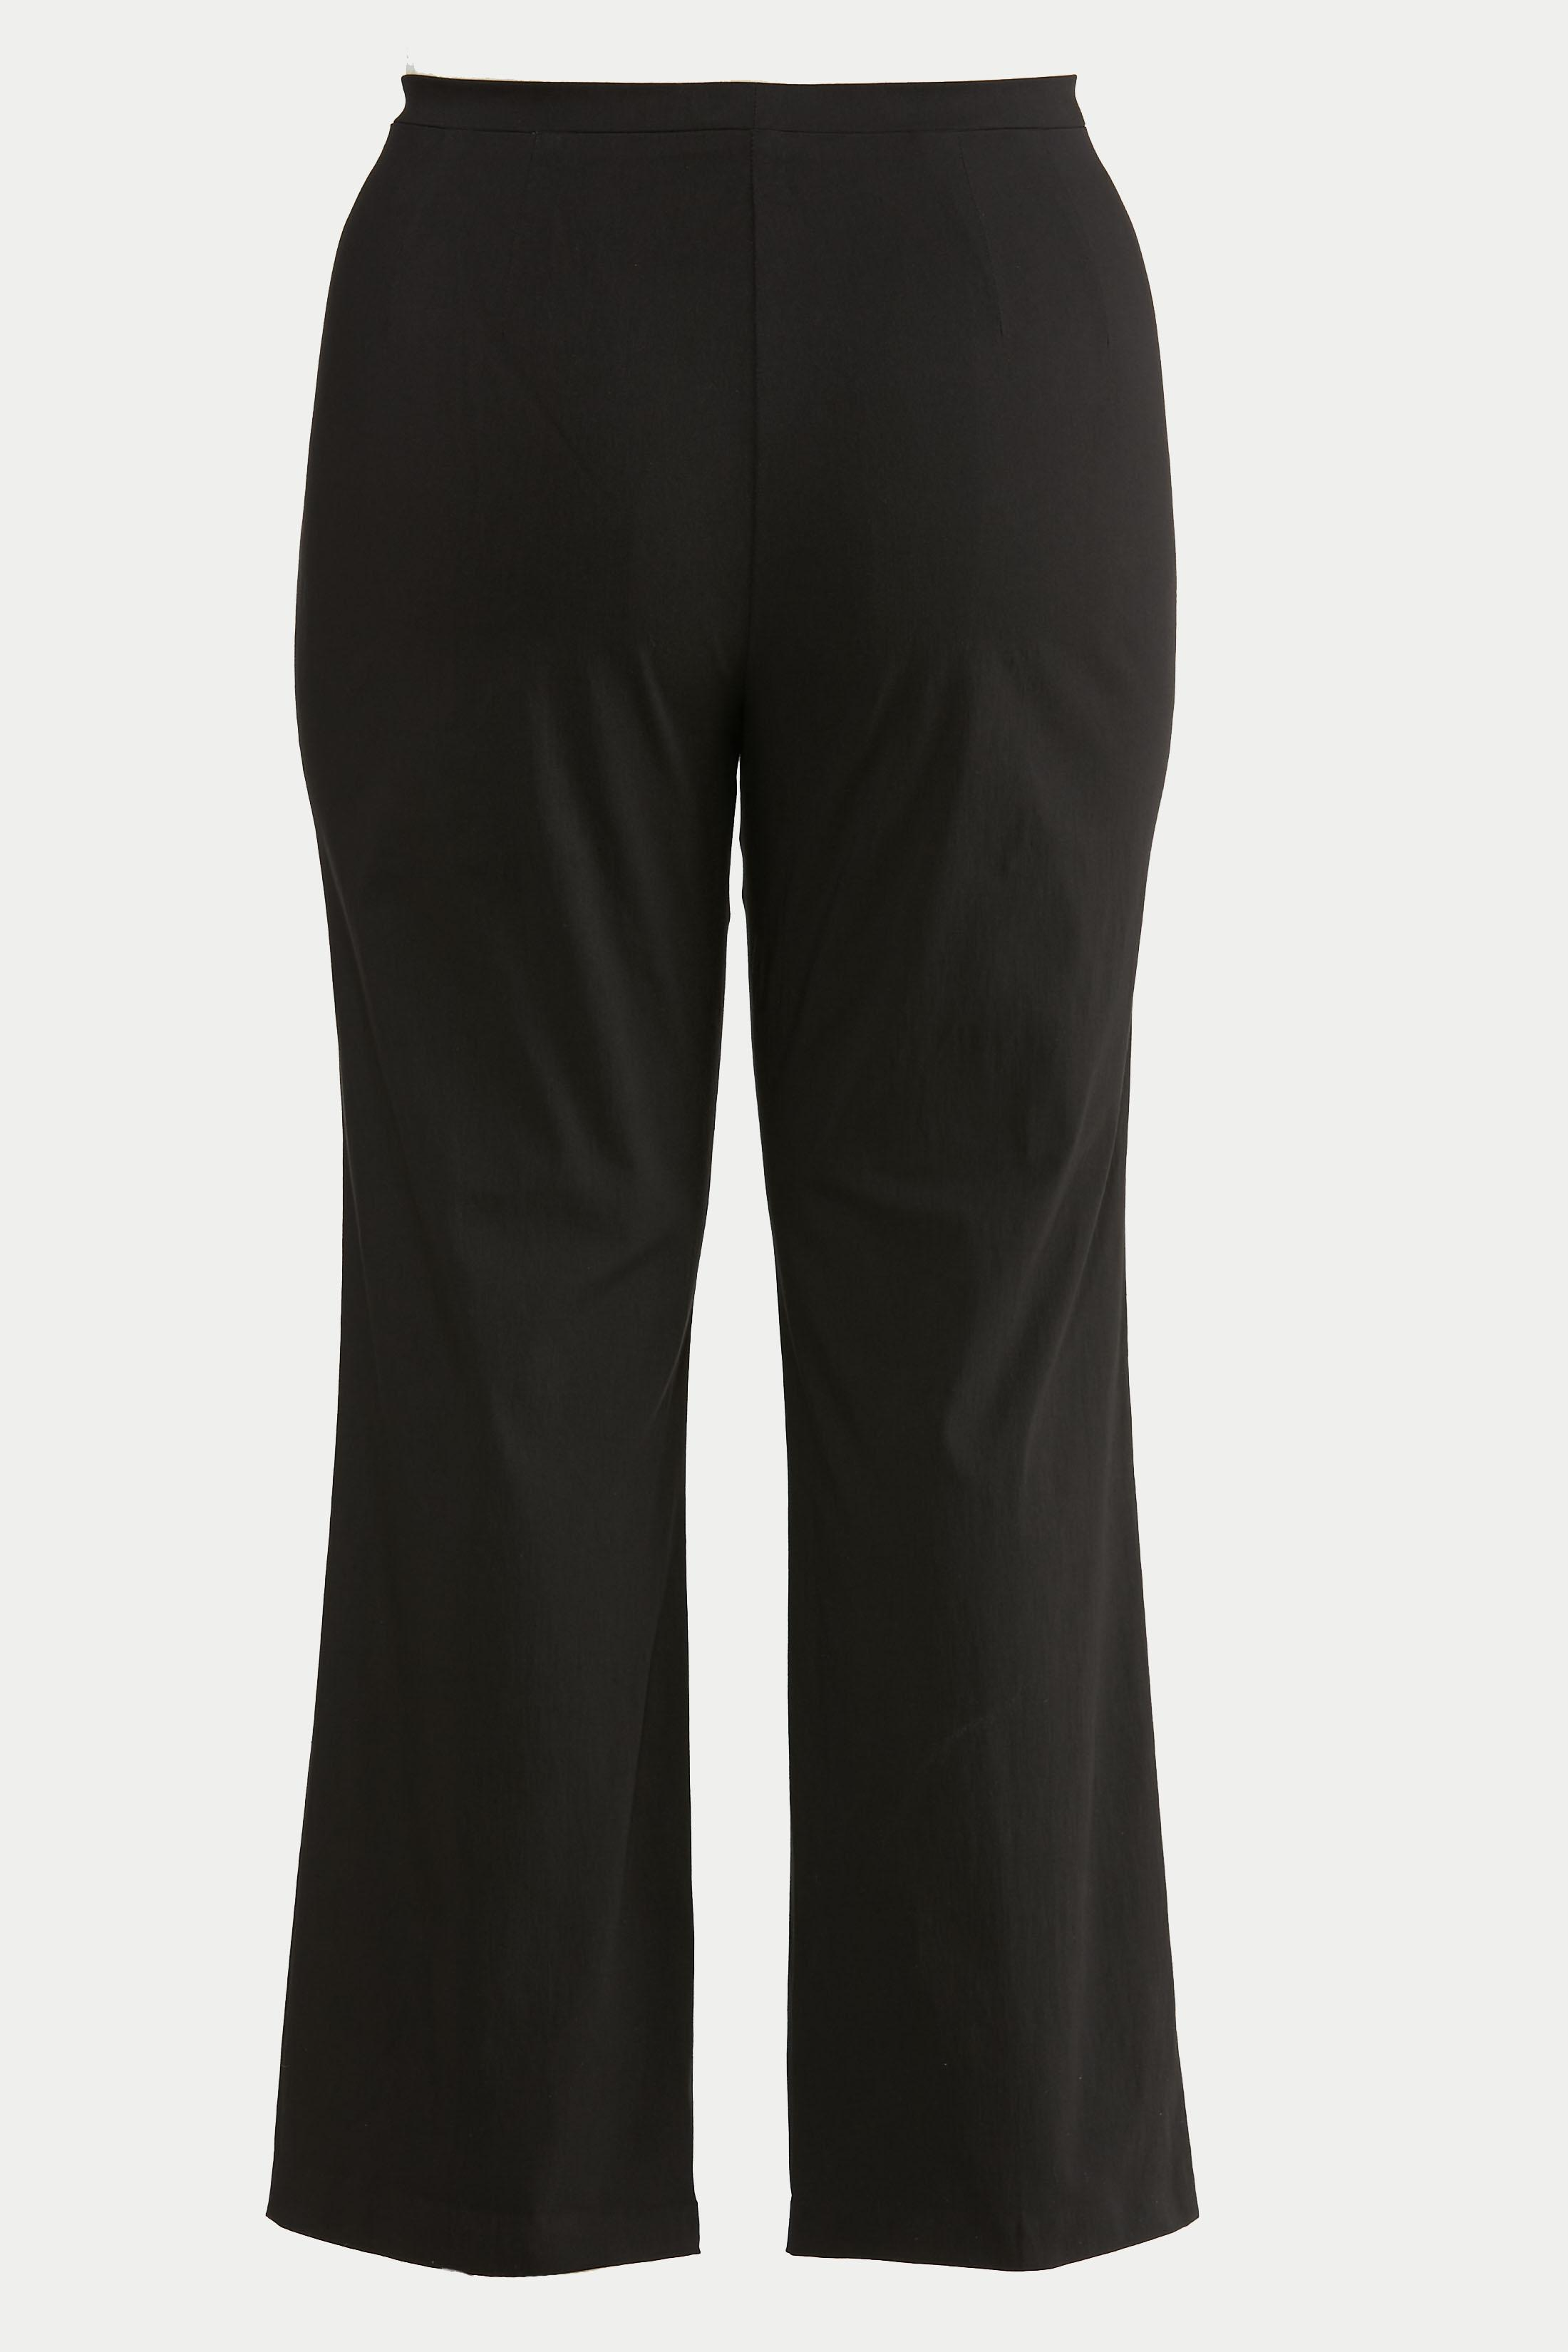 Plus Size Slit Hem Bootcut Pants (Item #44637411)